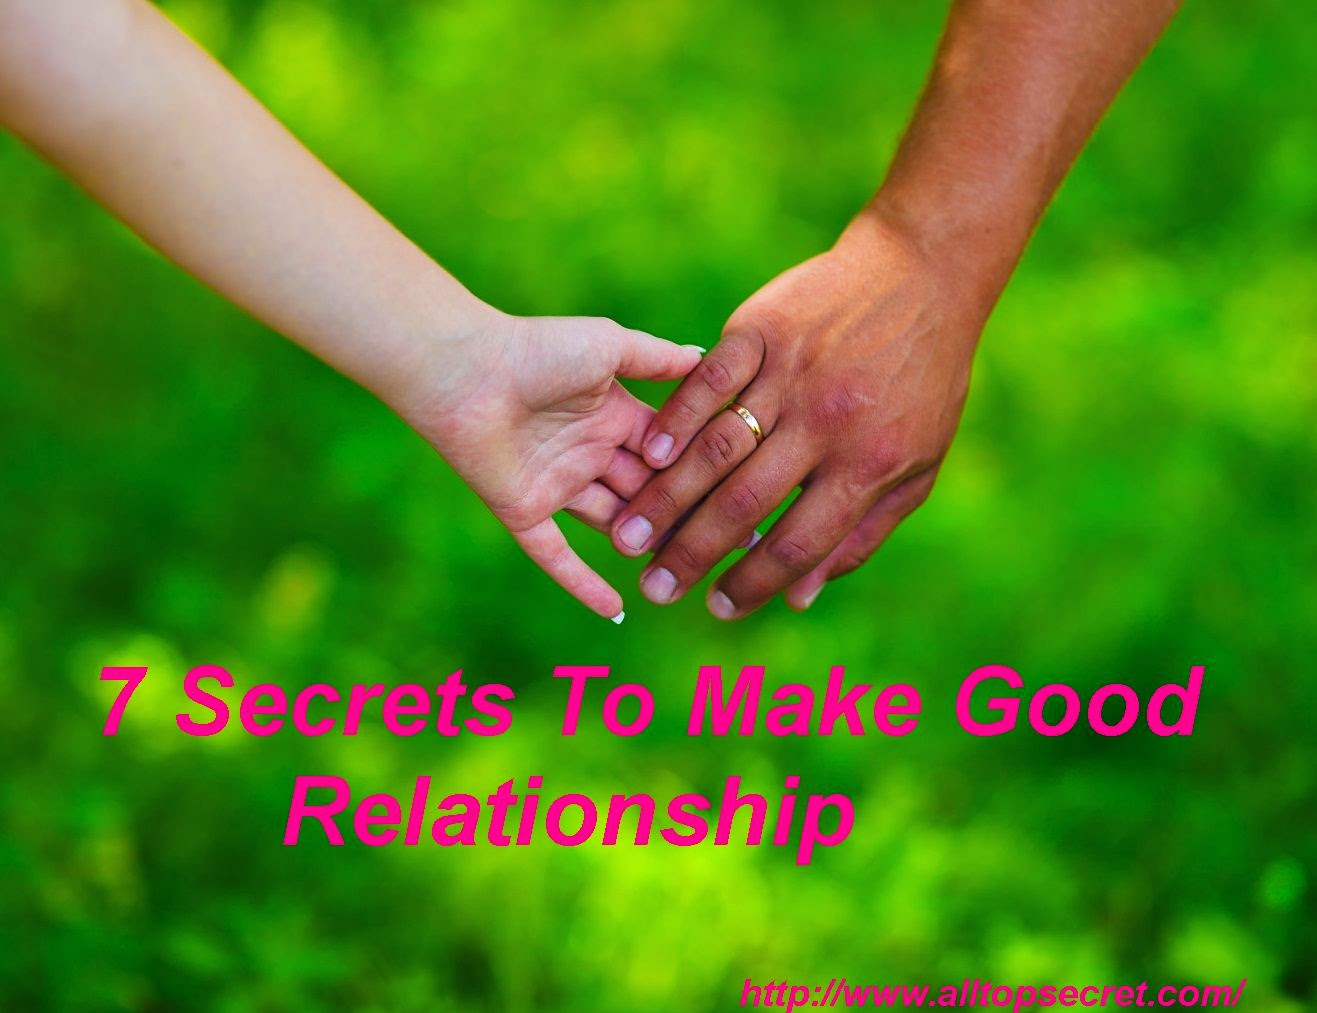 7 secrets to make good relationship